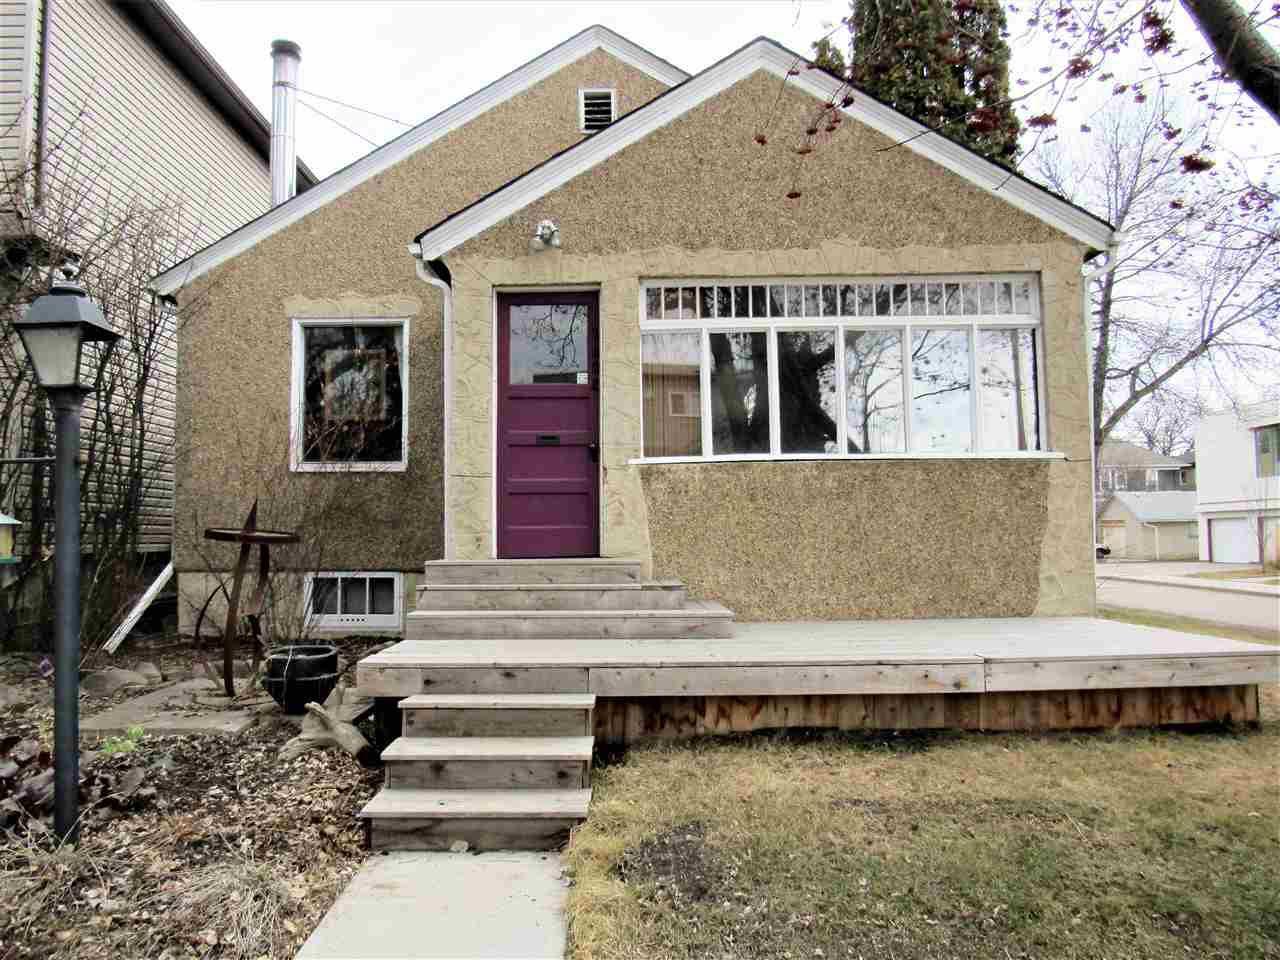 Main Photo: 9802 83 Avenue in Edmonton: Zone 15 House for sale : MLS®# E4152478